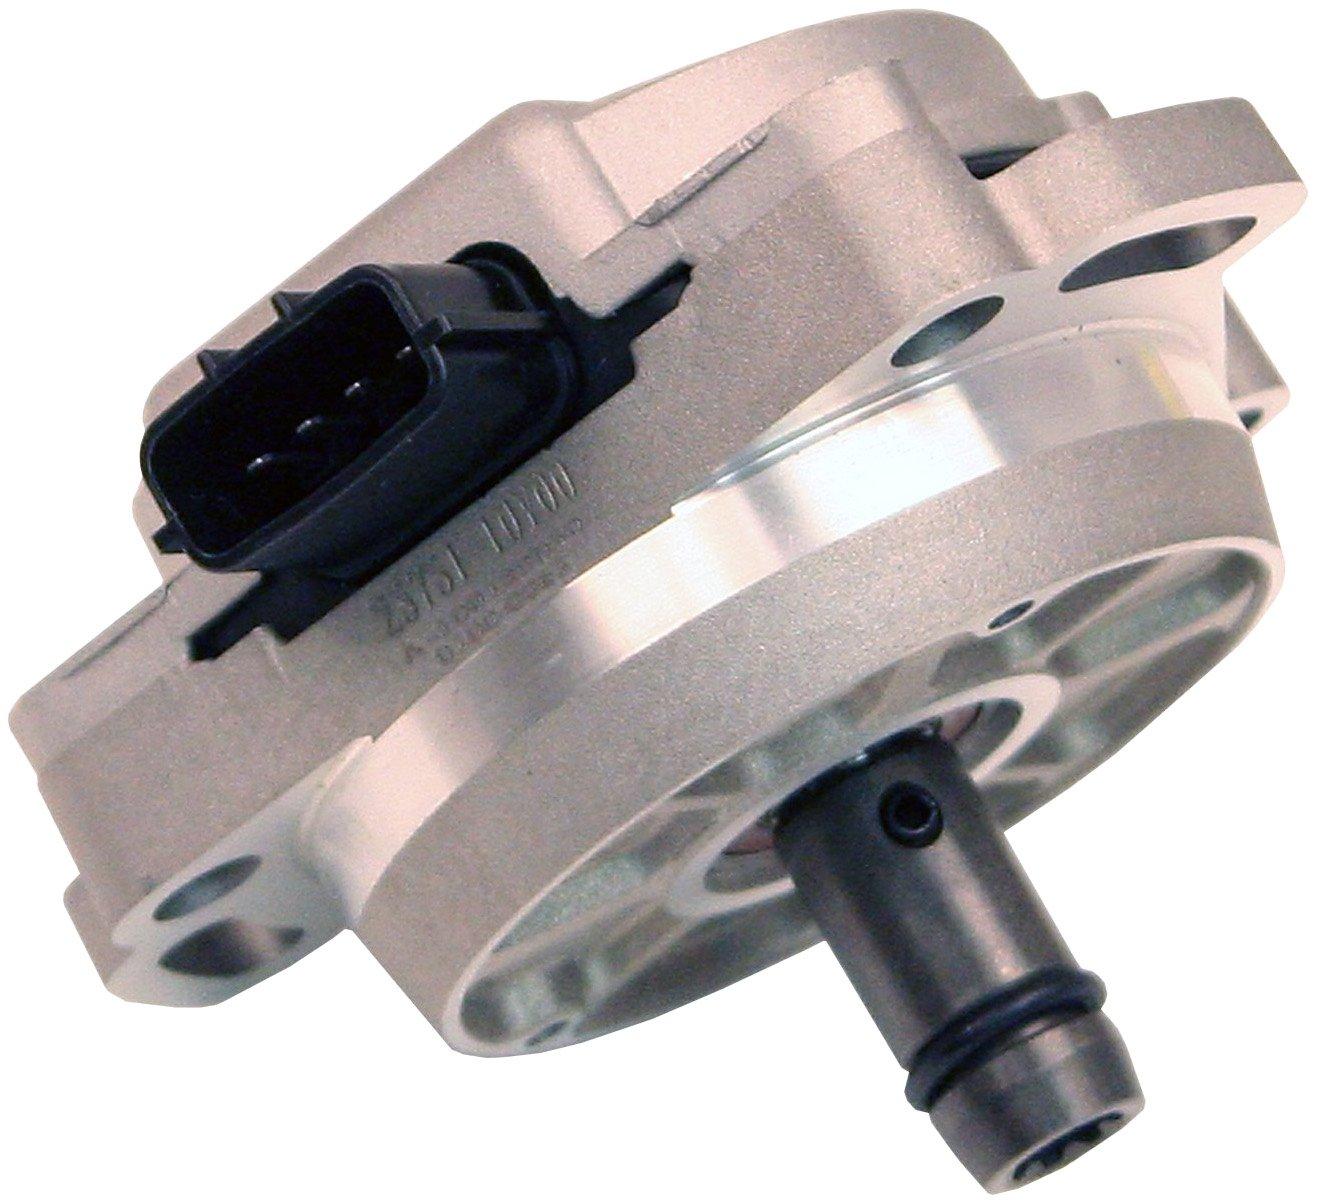 Beck/Arnley 201-1763 Engine Oil Pressure Switch Beck Arnley BEC201-1763